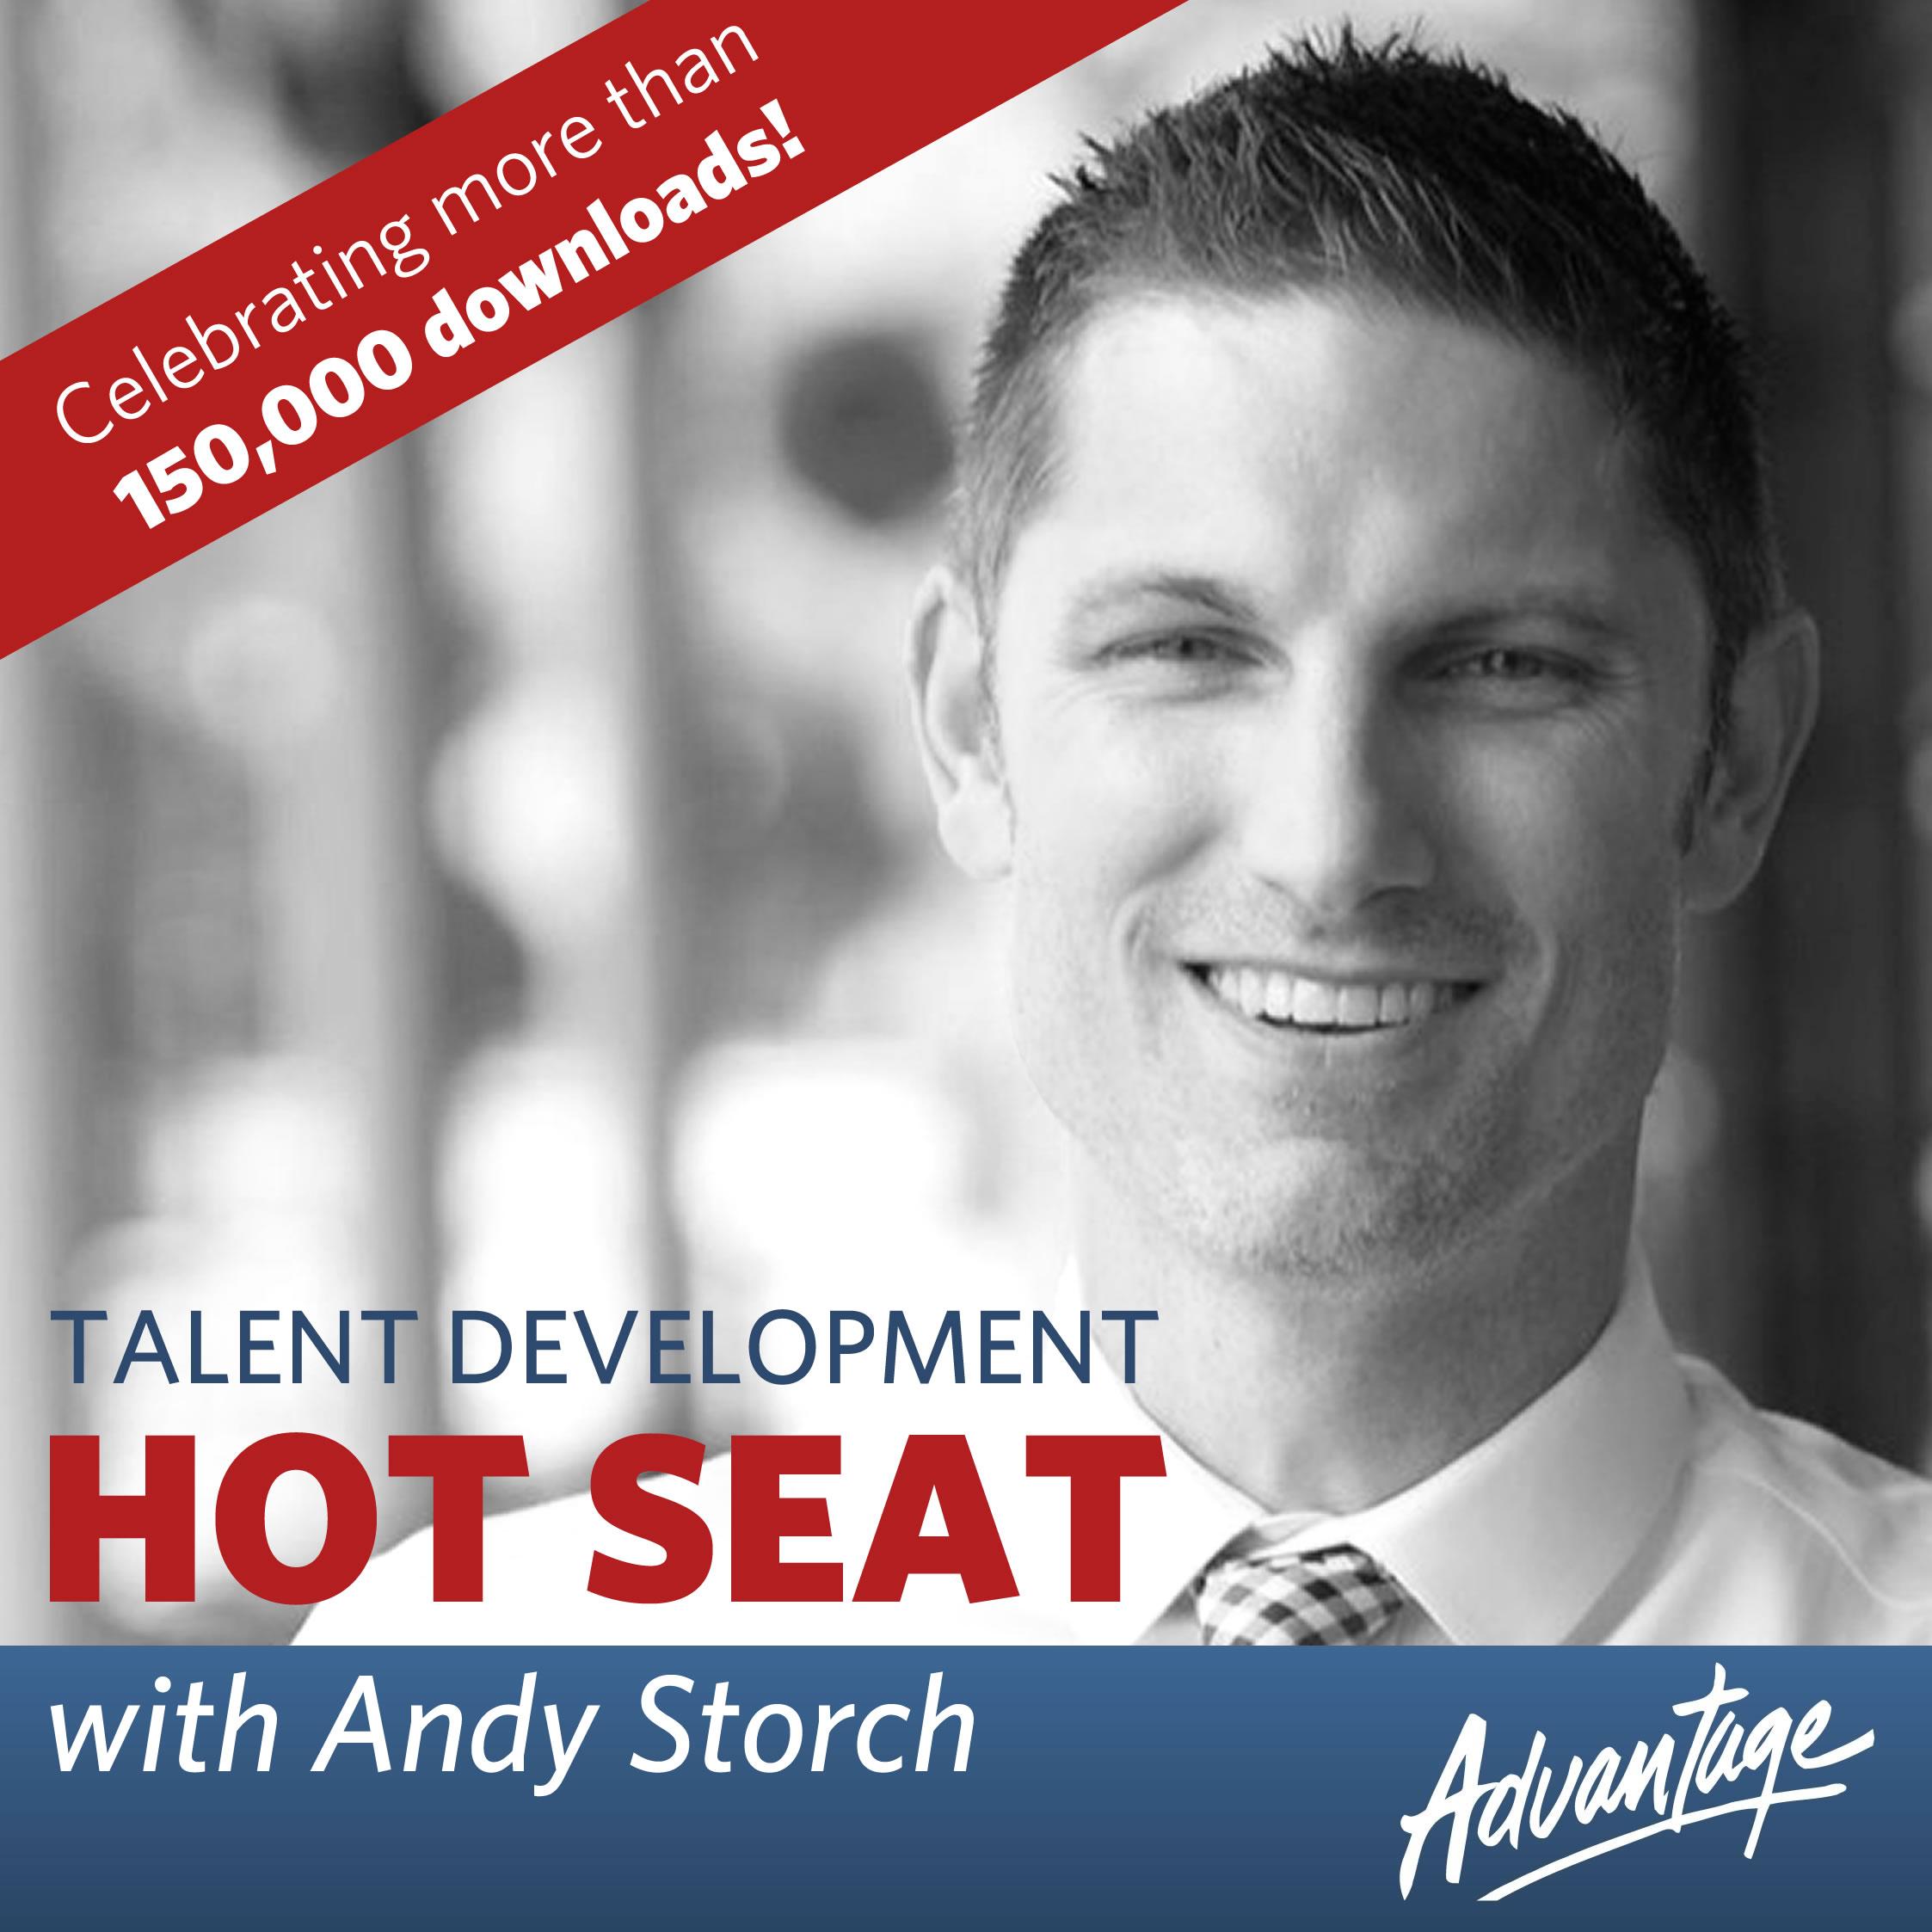 Talent Develop Hot Seat Podcast 2020 logo